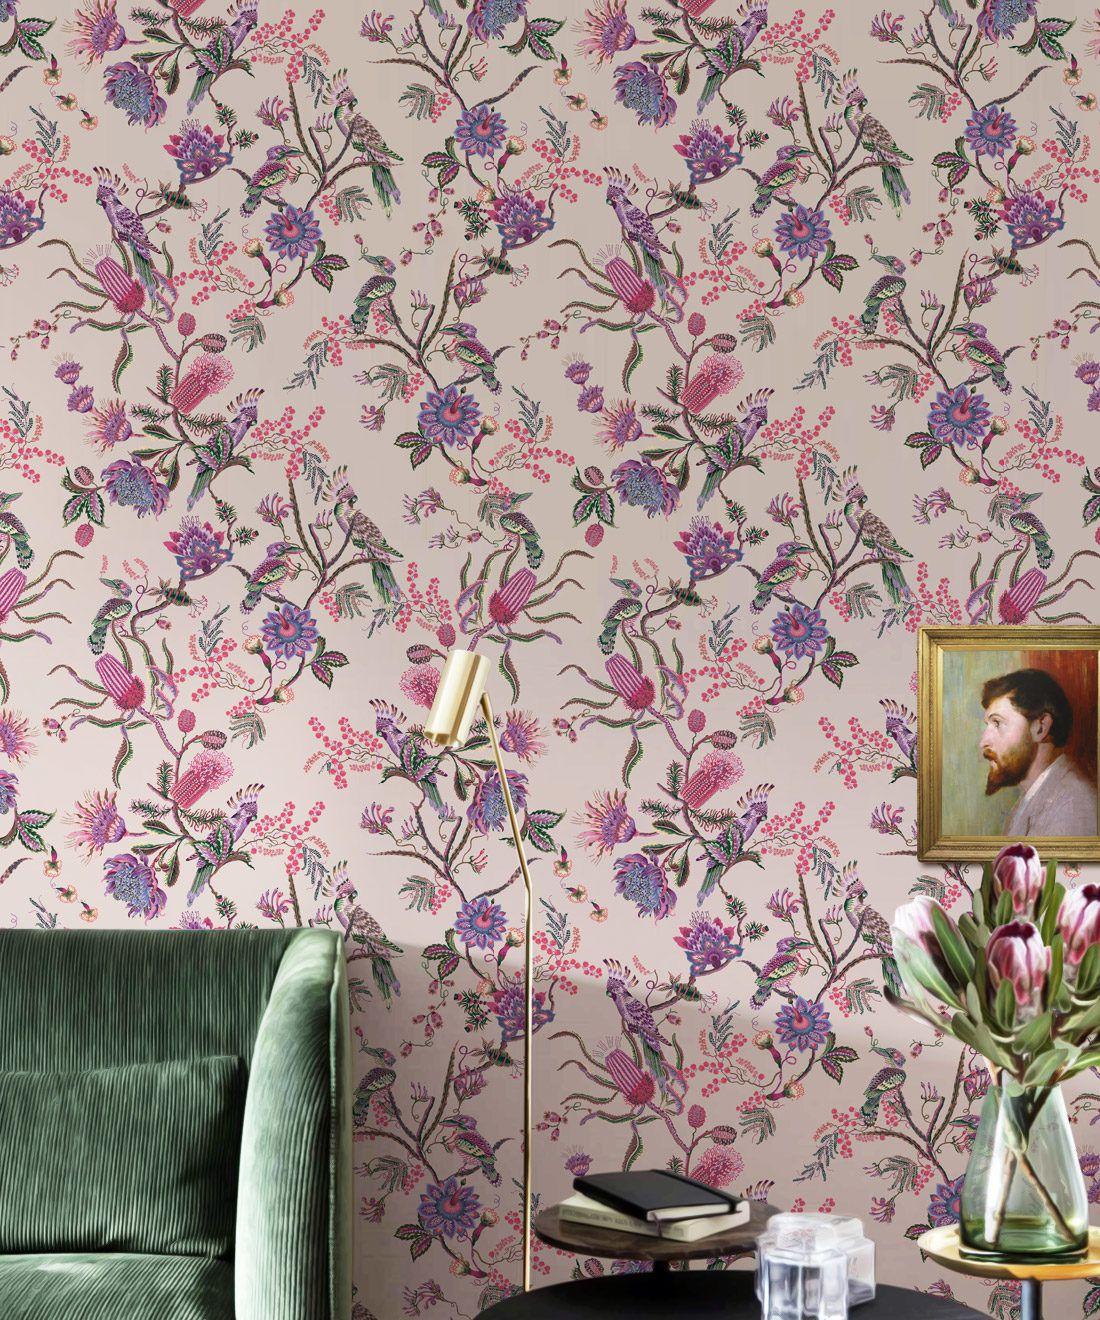 Matilda Wallpaper • Cockatoo, kookaburra • Australian Wallpaper • Milton & King USA • Pinky Insitu